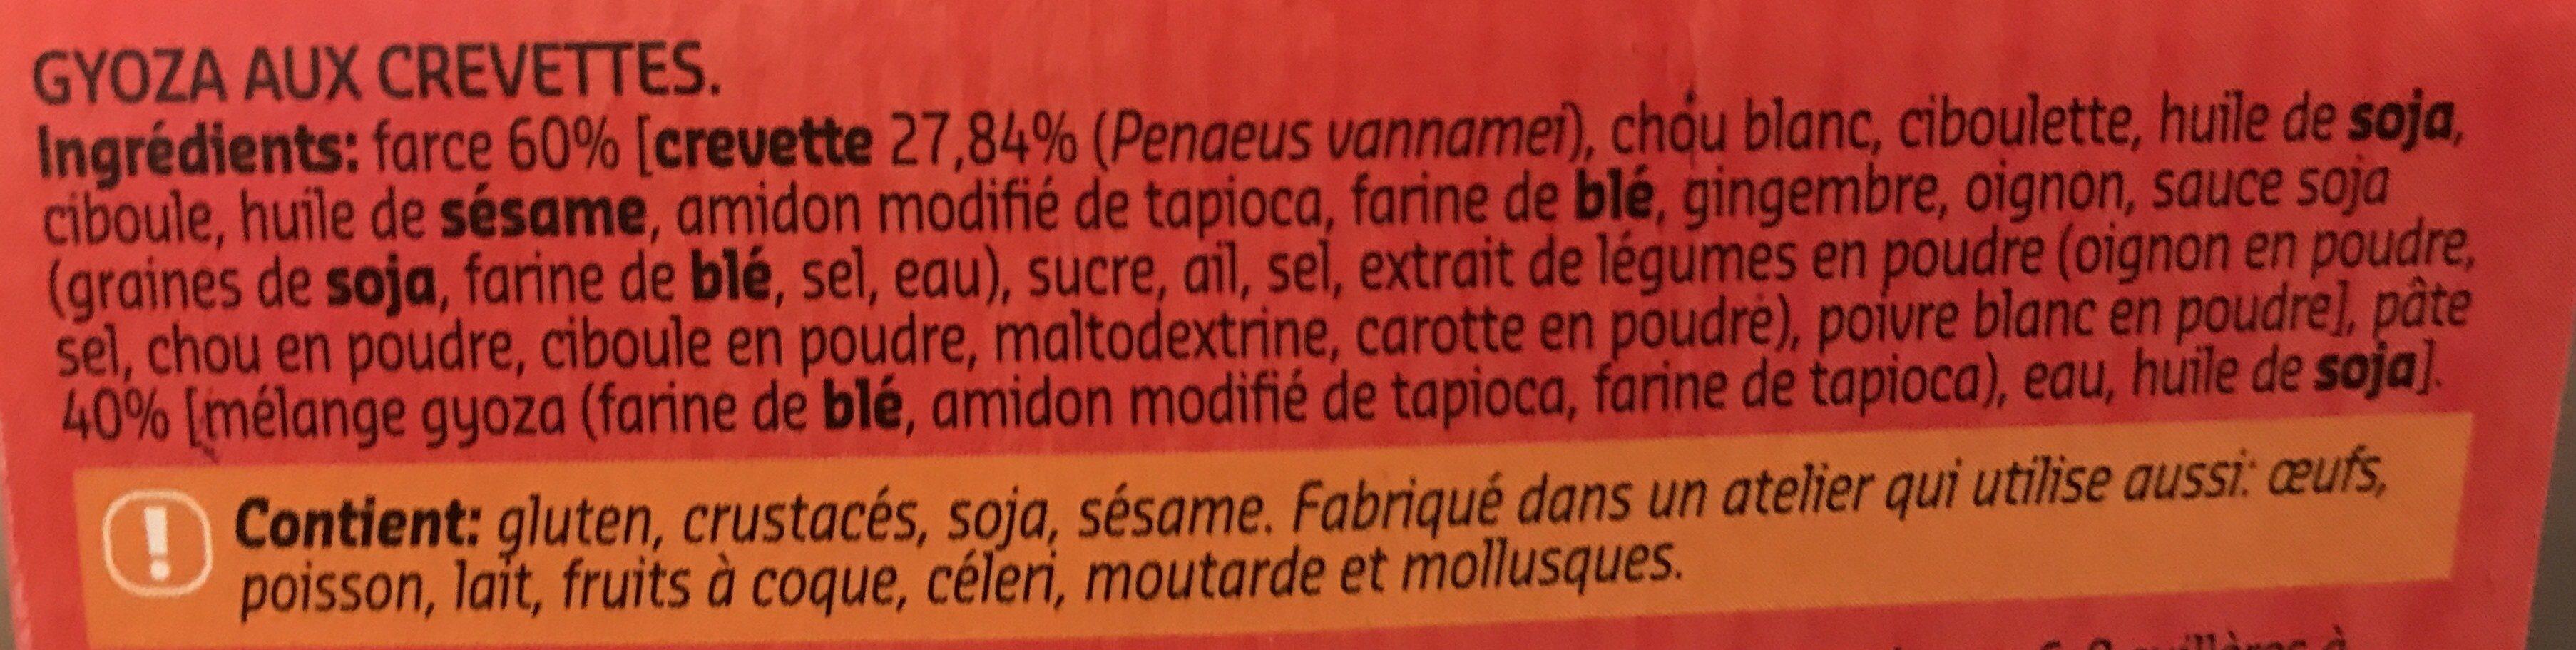 Gyoza crevettes - Ingredients - fr